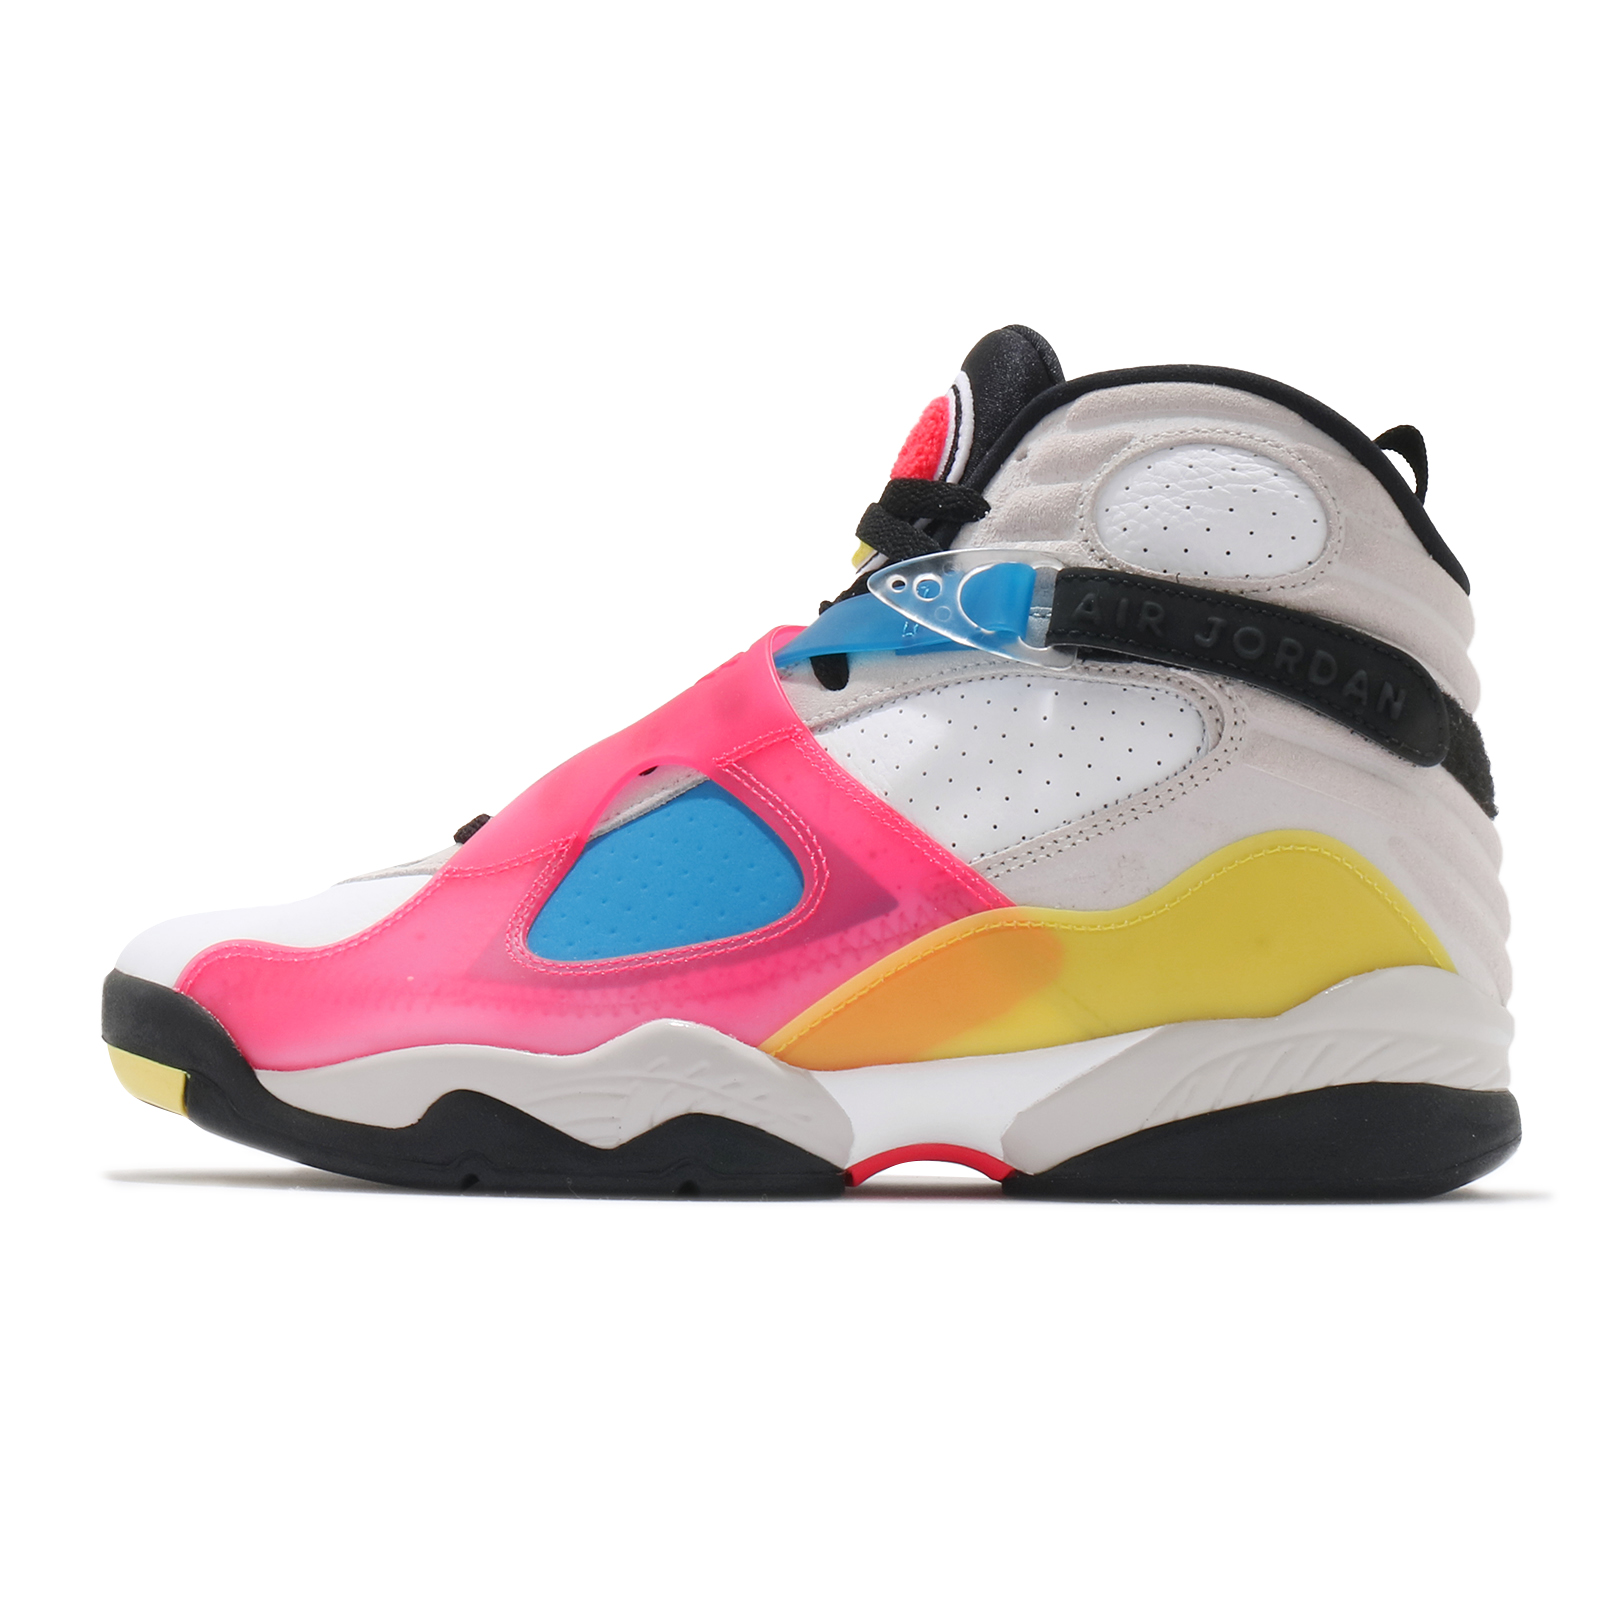 Nike Air Jordan 8 Retro SE 彩色 白 藍 粉紅 紅 喬丹 8代【ACS】 BQ7666-100